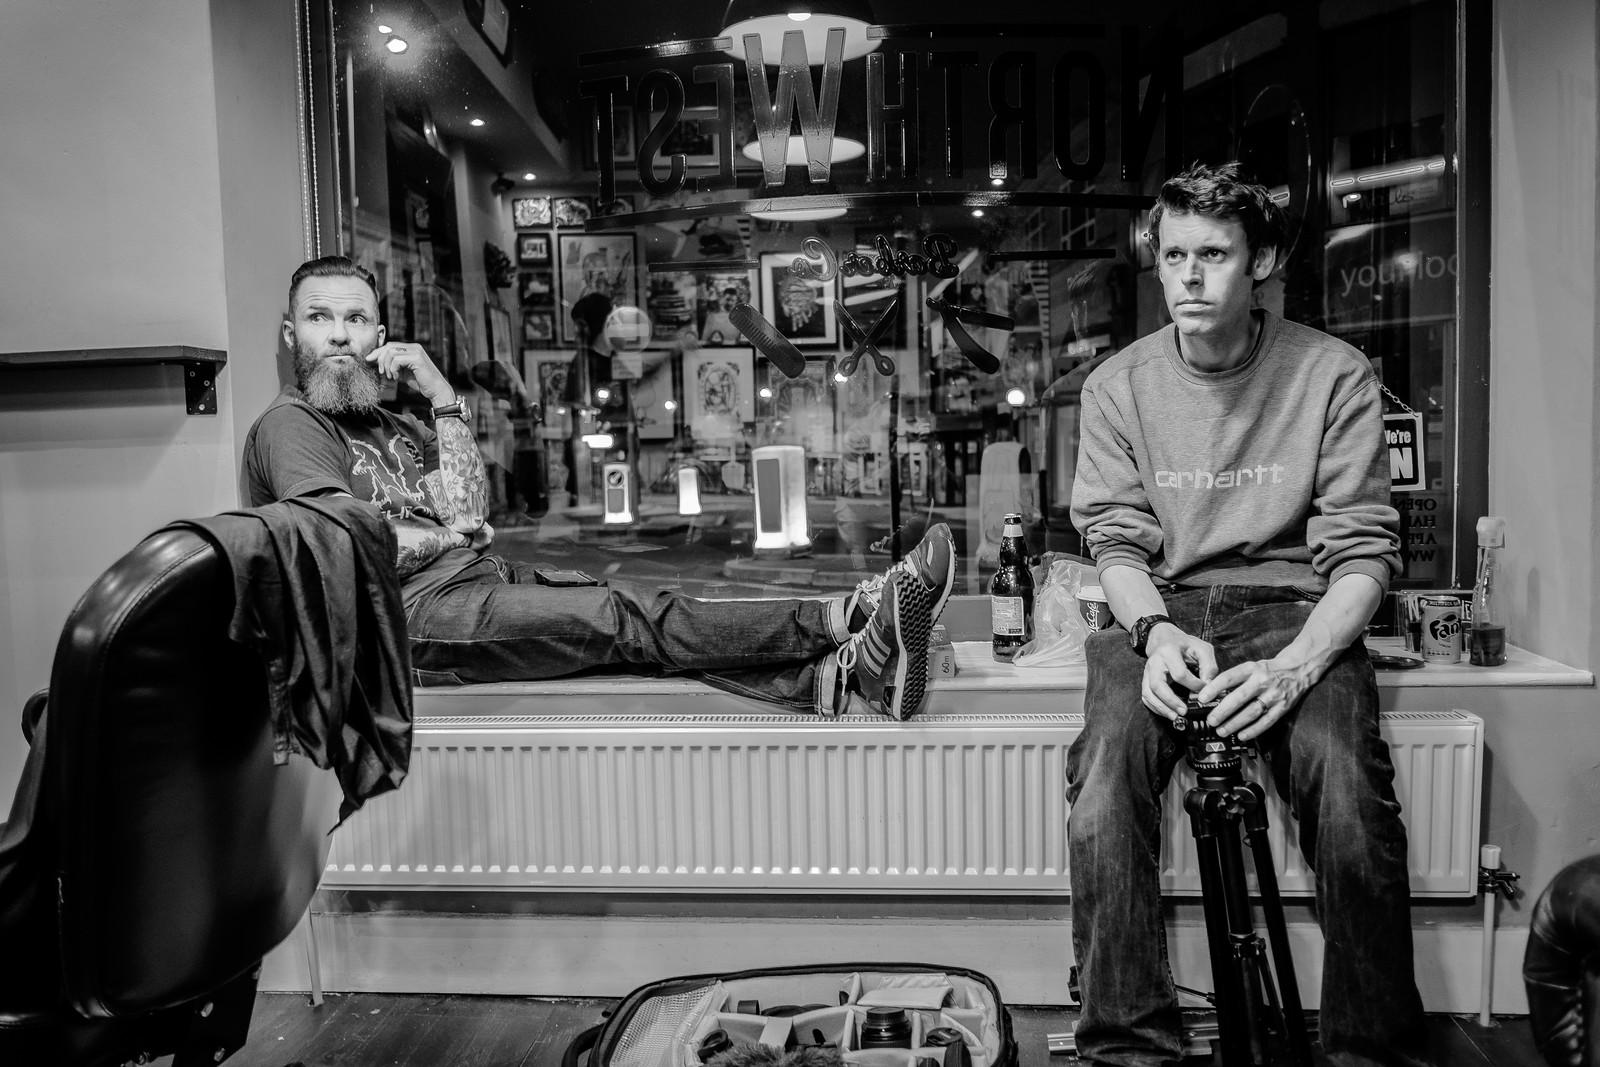 Barbershop, Accrington, Lancashire